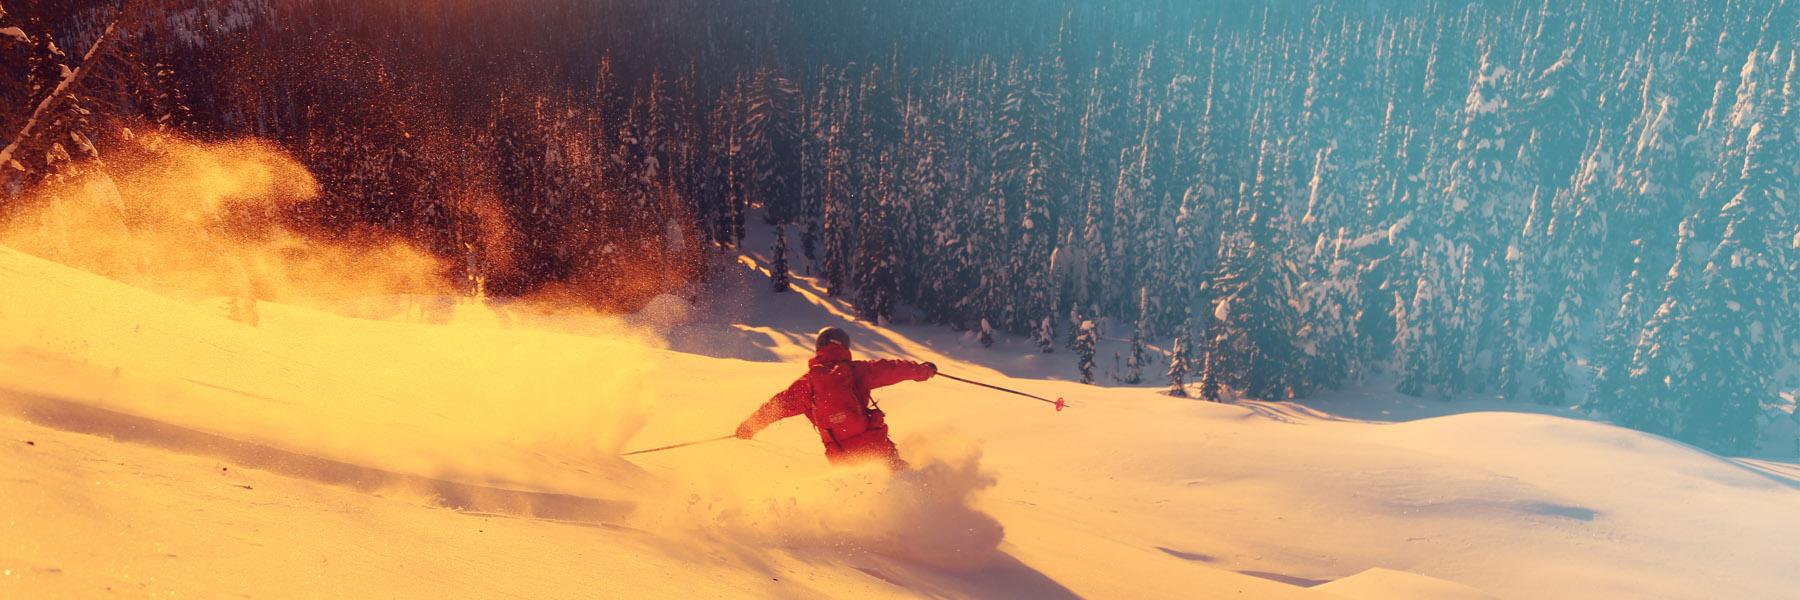 skihomepages_0011_Turquoise Haze